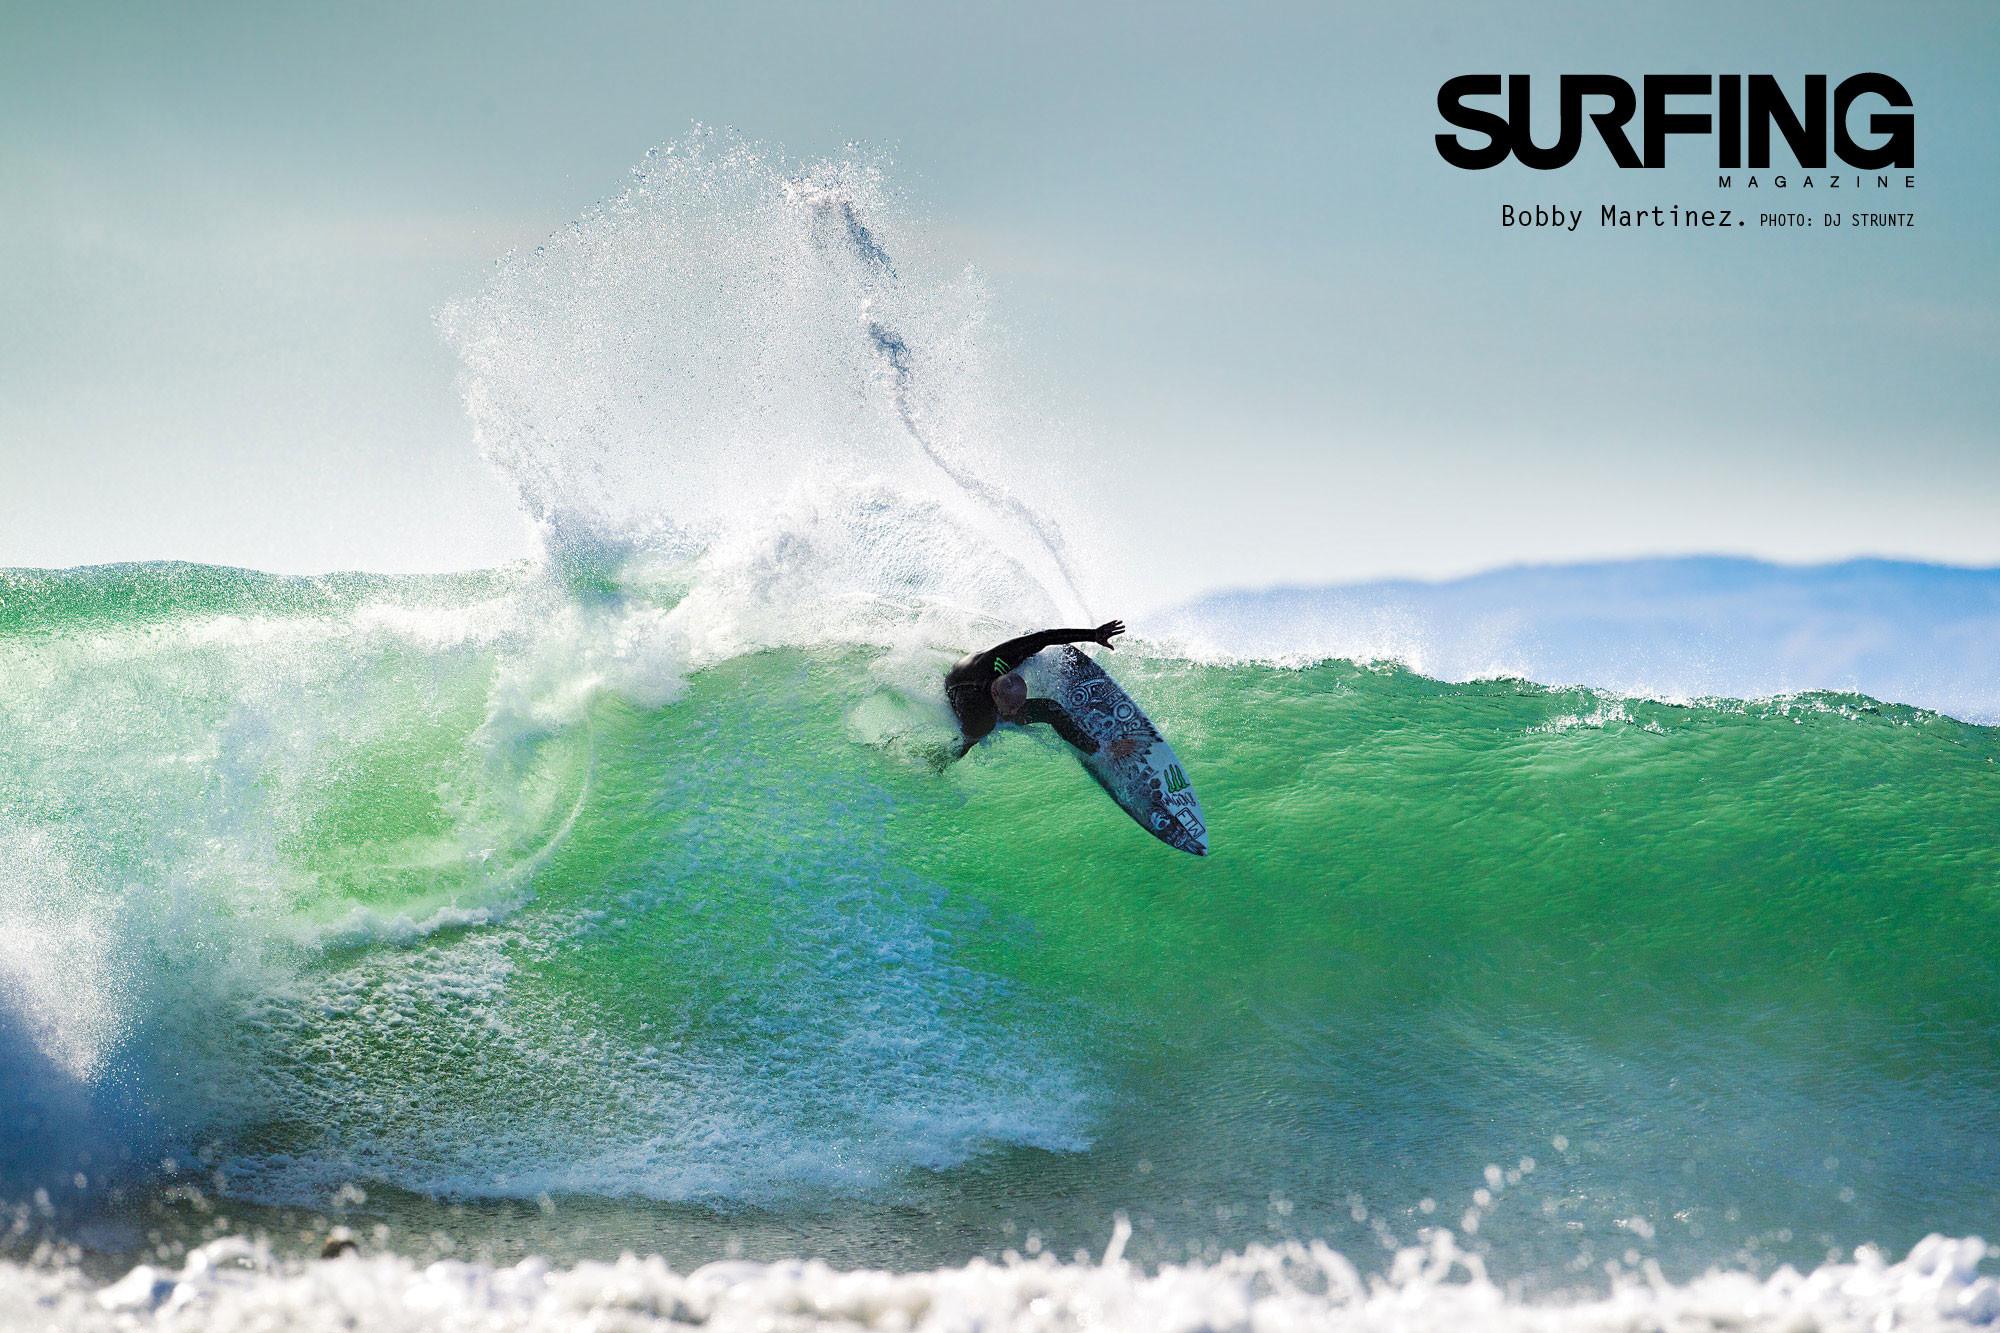 surfing desktop wallpaper bobby martinez dj struntz surfing magazine  610×406 SURFING Magazine May 2012 Wallpaper